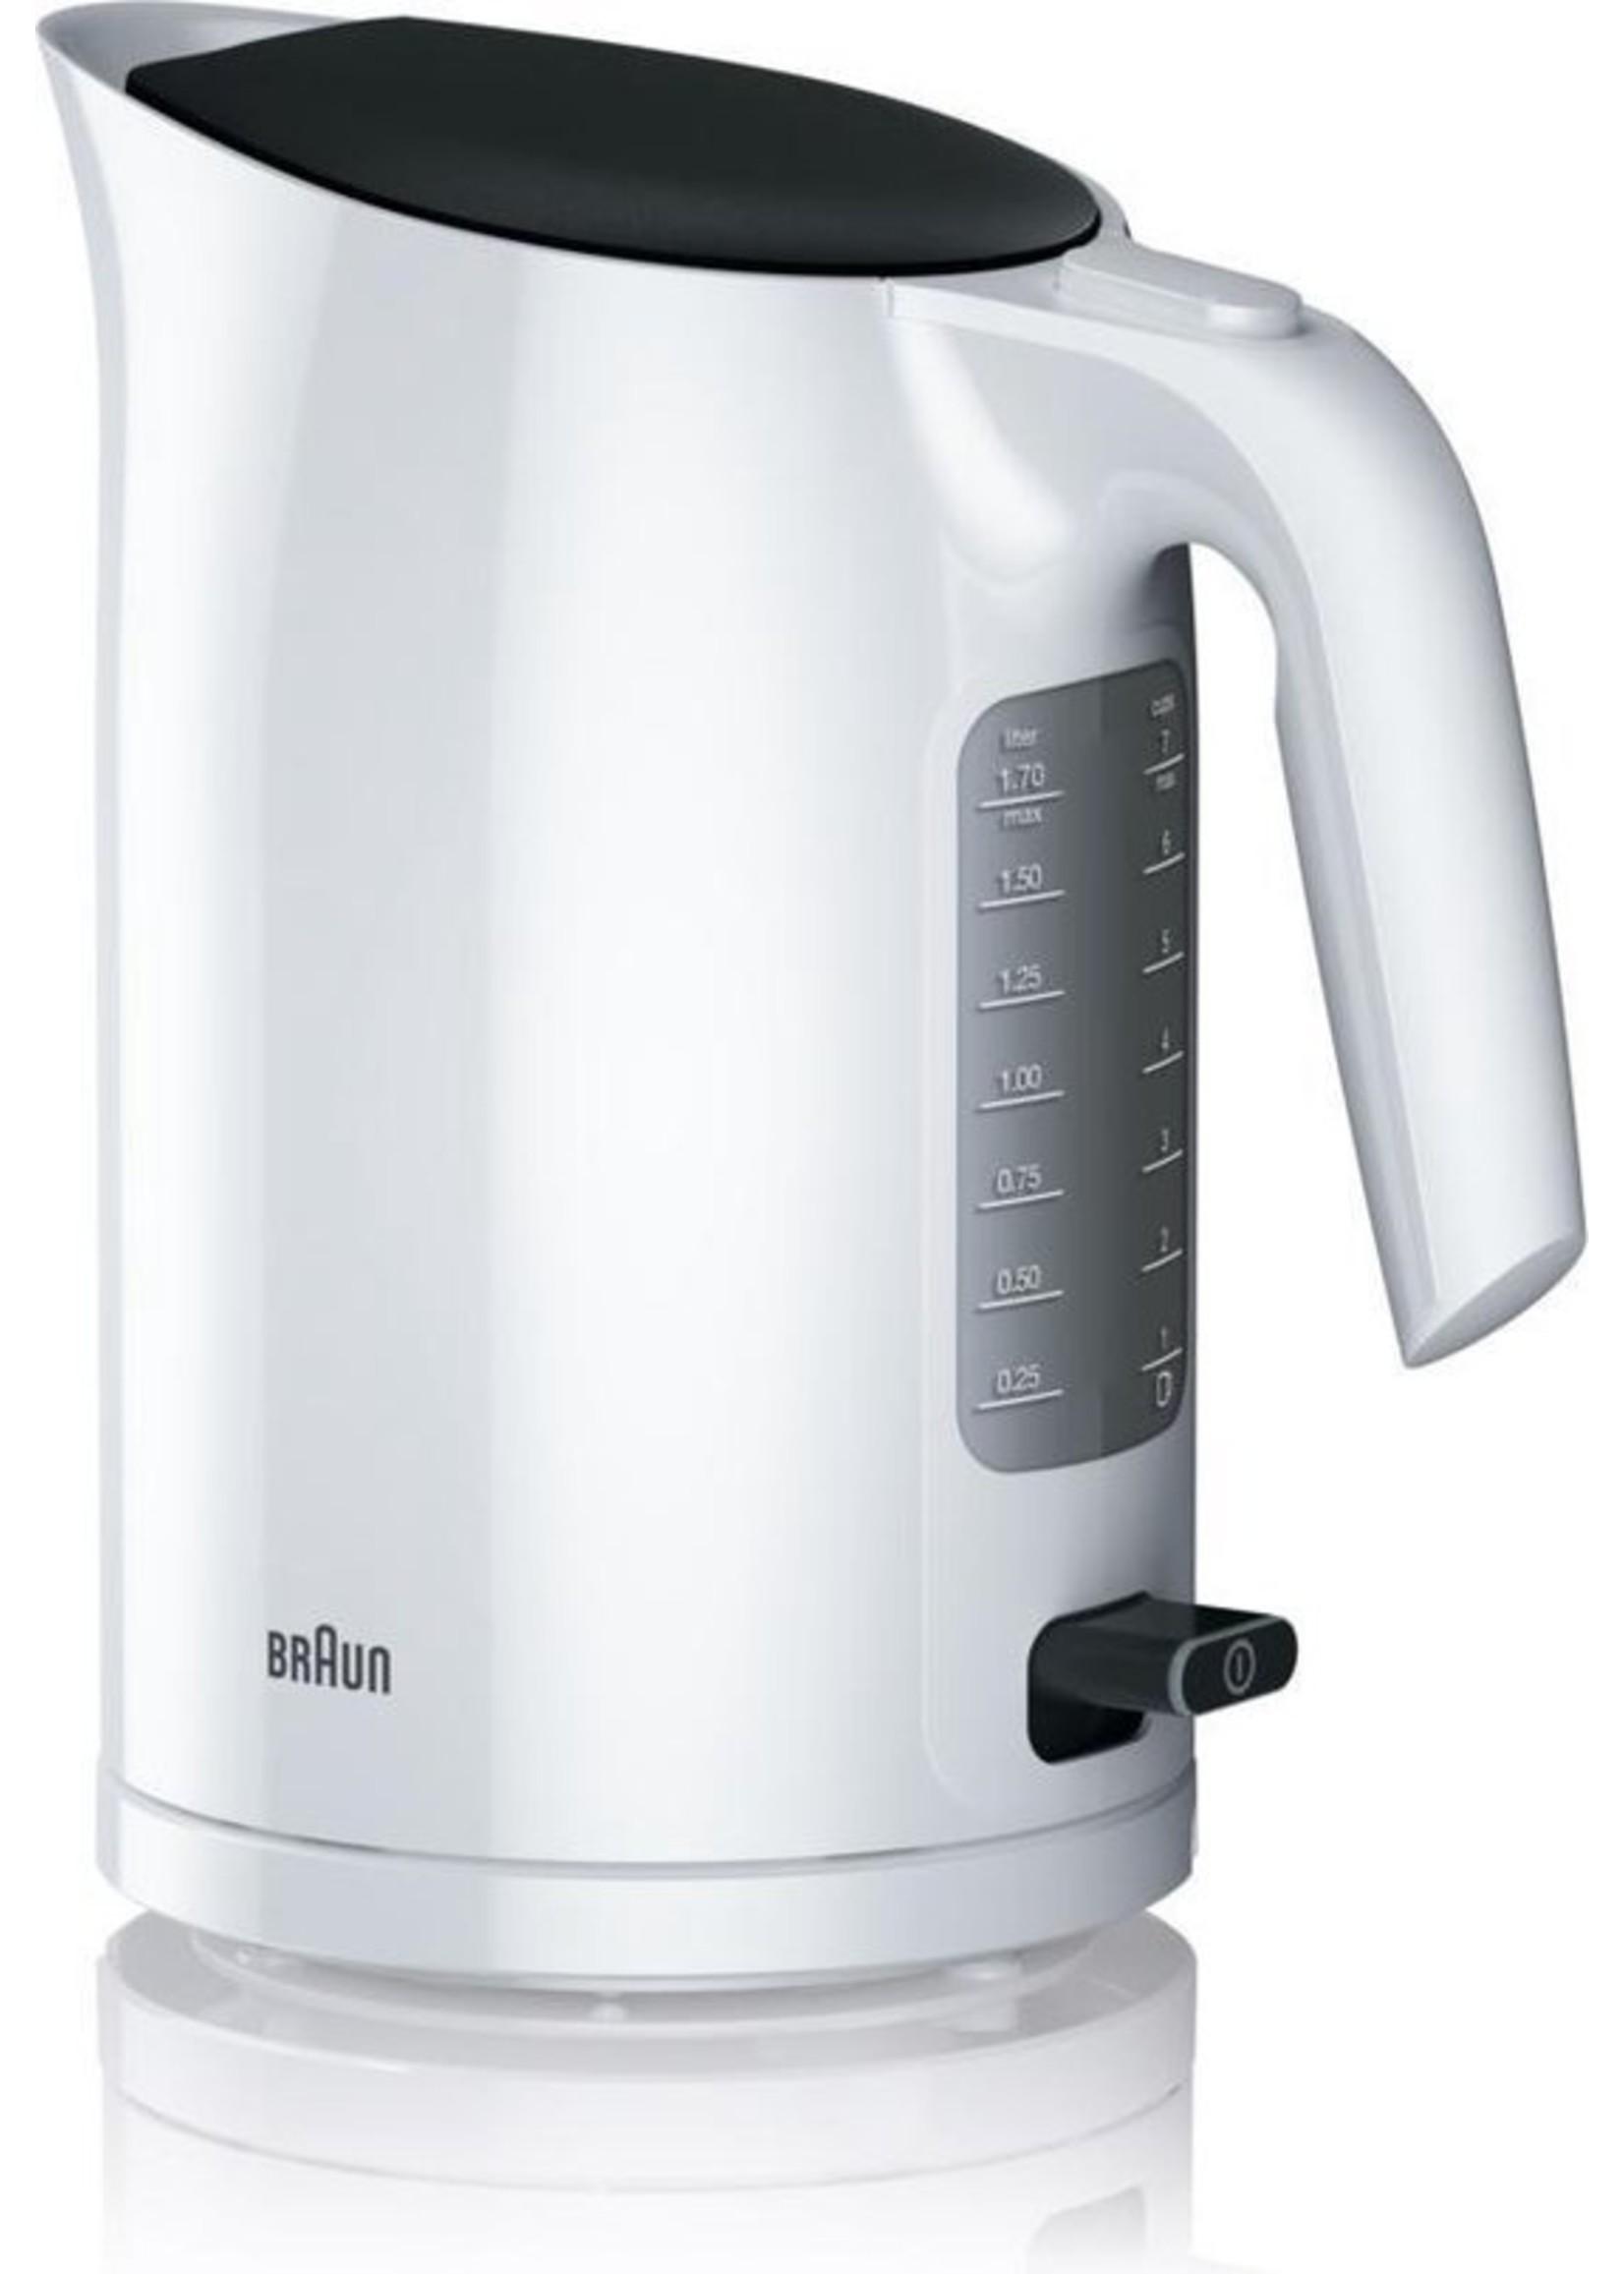 Braun Braun PurEase WK 3100 WH - Waterkoker - Wit